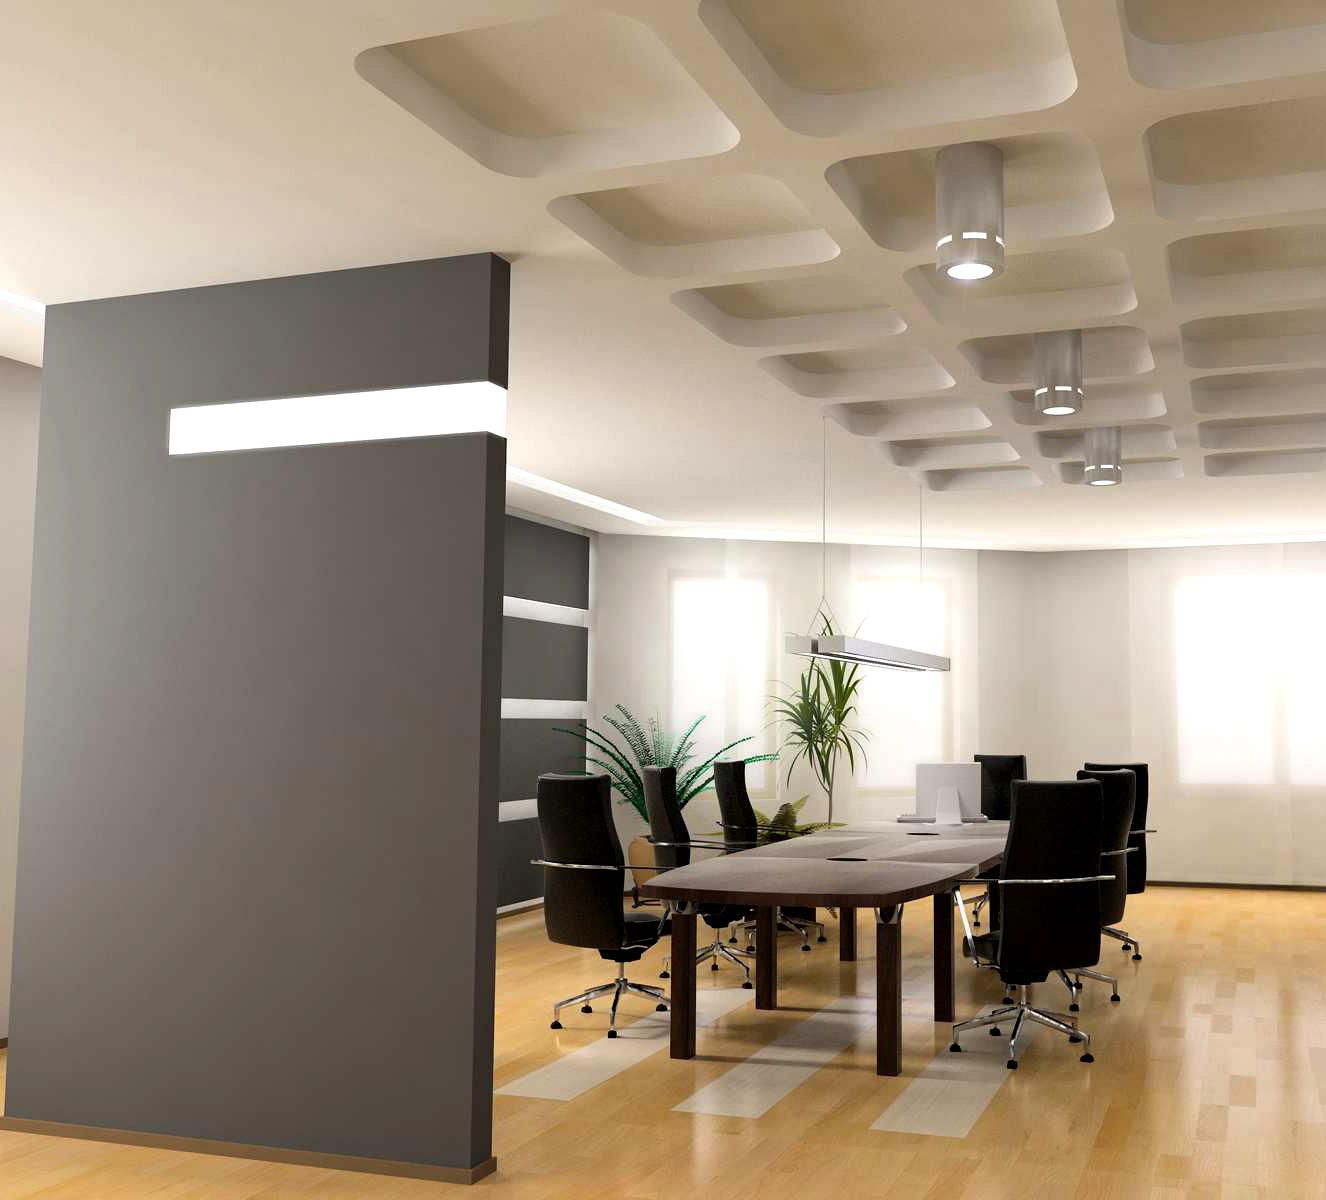 20111130_155434_Best-Office-Furnitures-Interior-Design-Ideas22